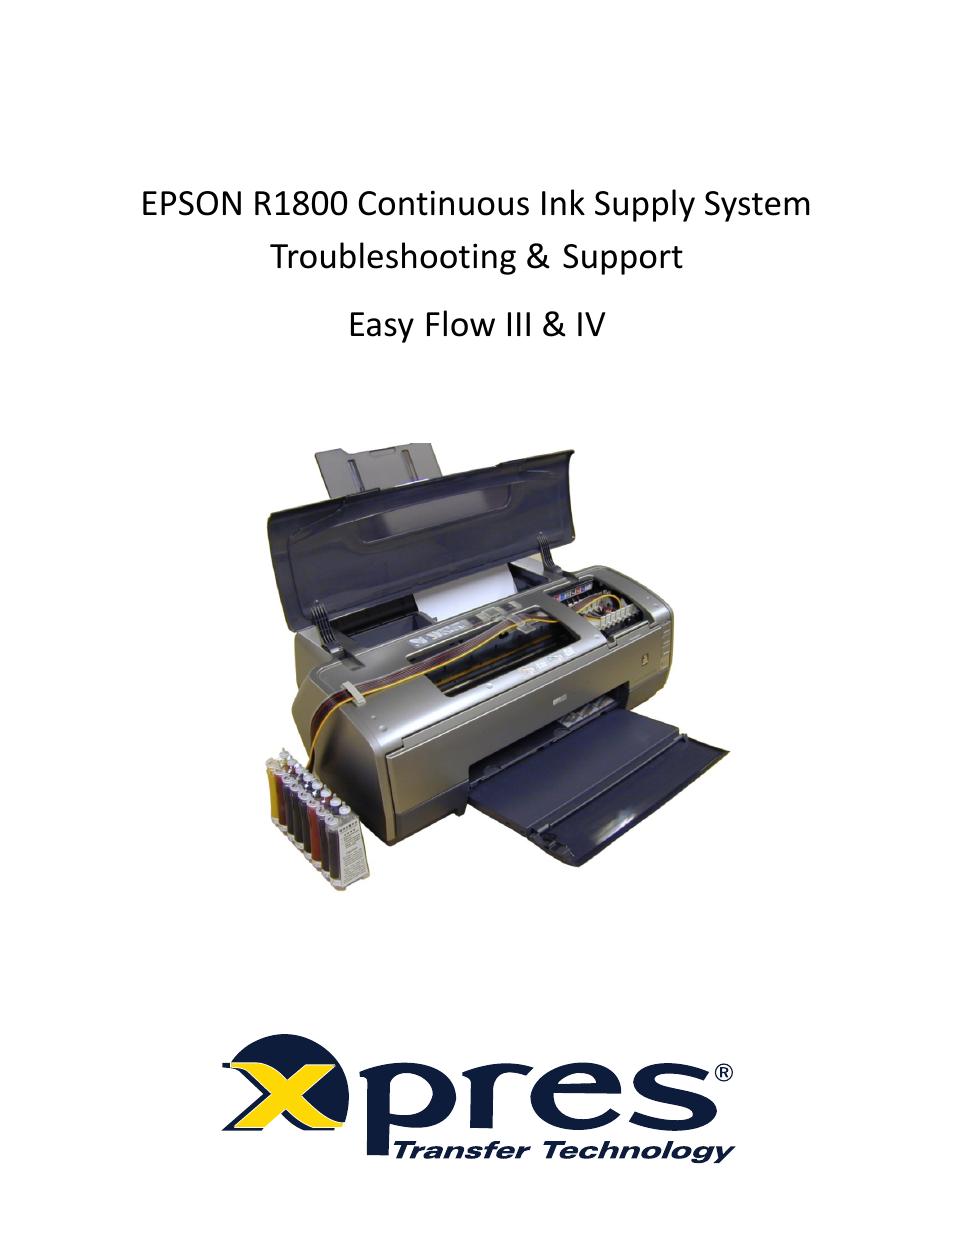 xpres subli print epson r1800 feeder system troubleshooting guide rh manualsdir com Epson Printer for Sublimation Printing epson r1800 printer driver download